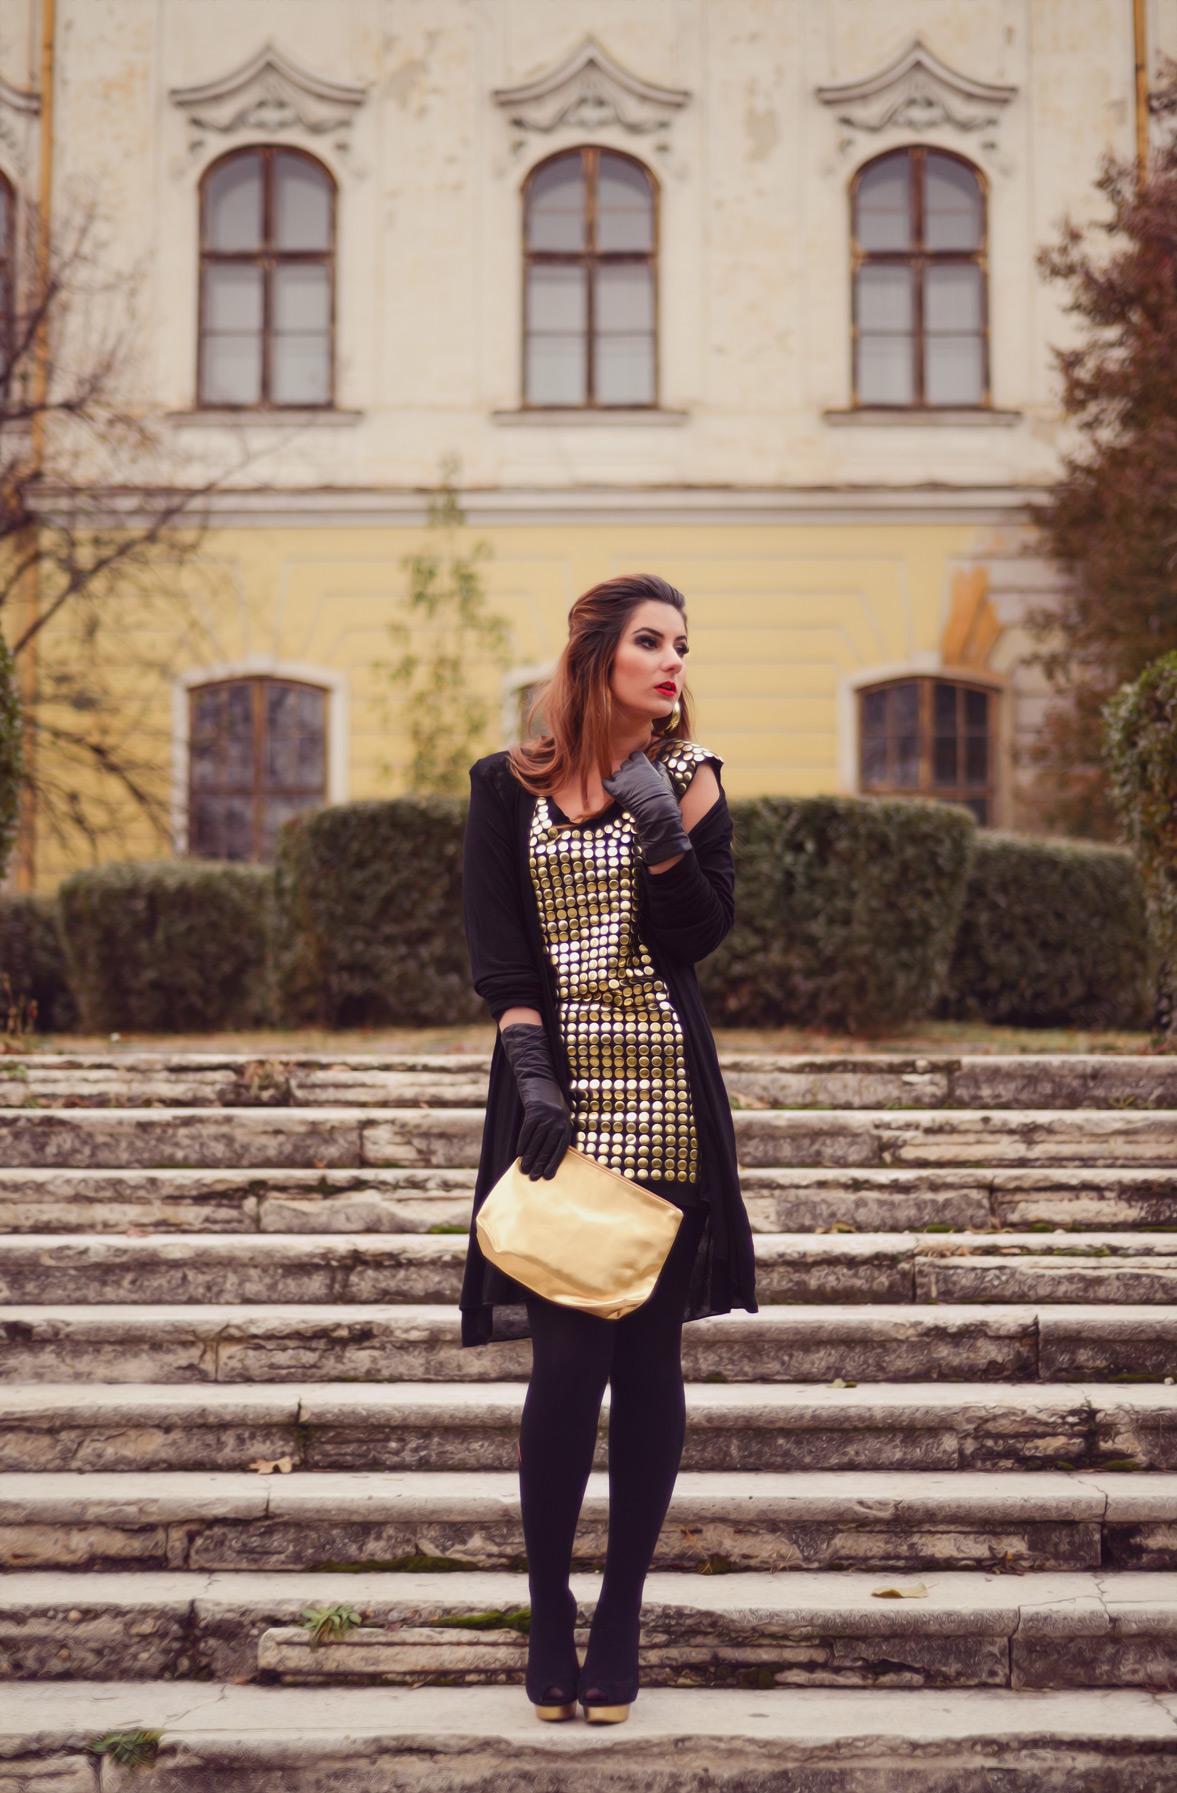 Rochie cu aplicații metalice aurii